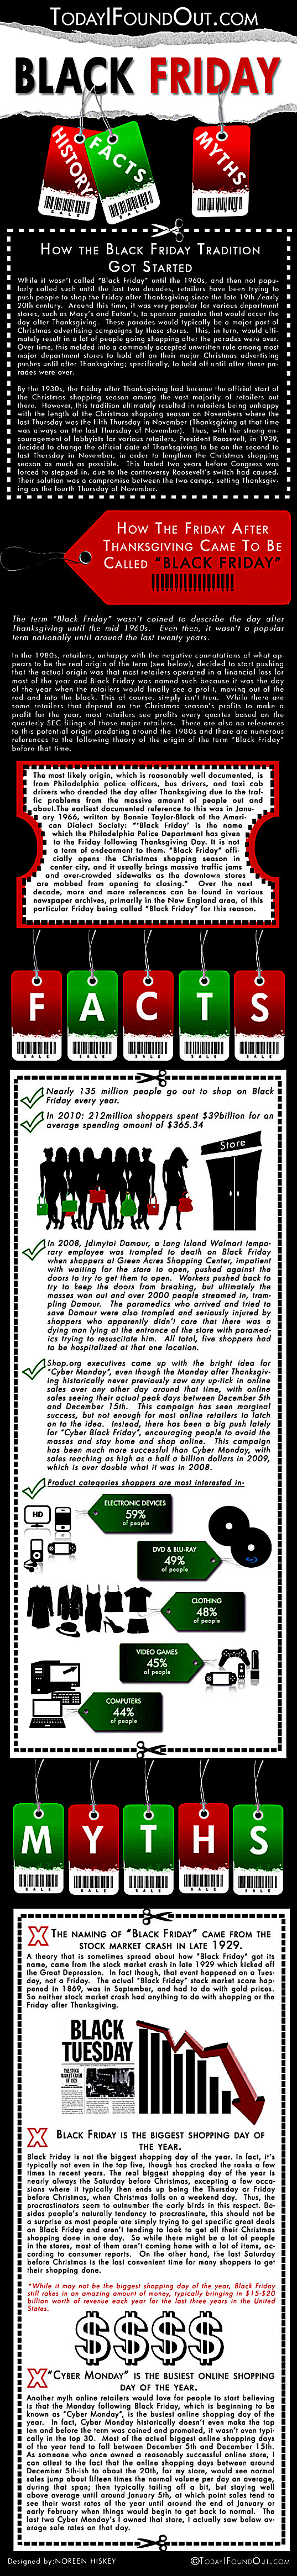 2 black-friday-facts-history--resized-601